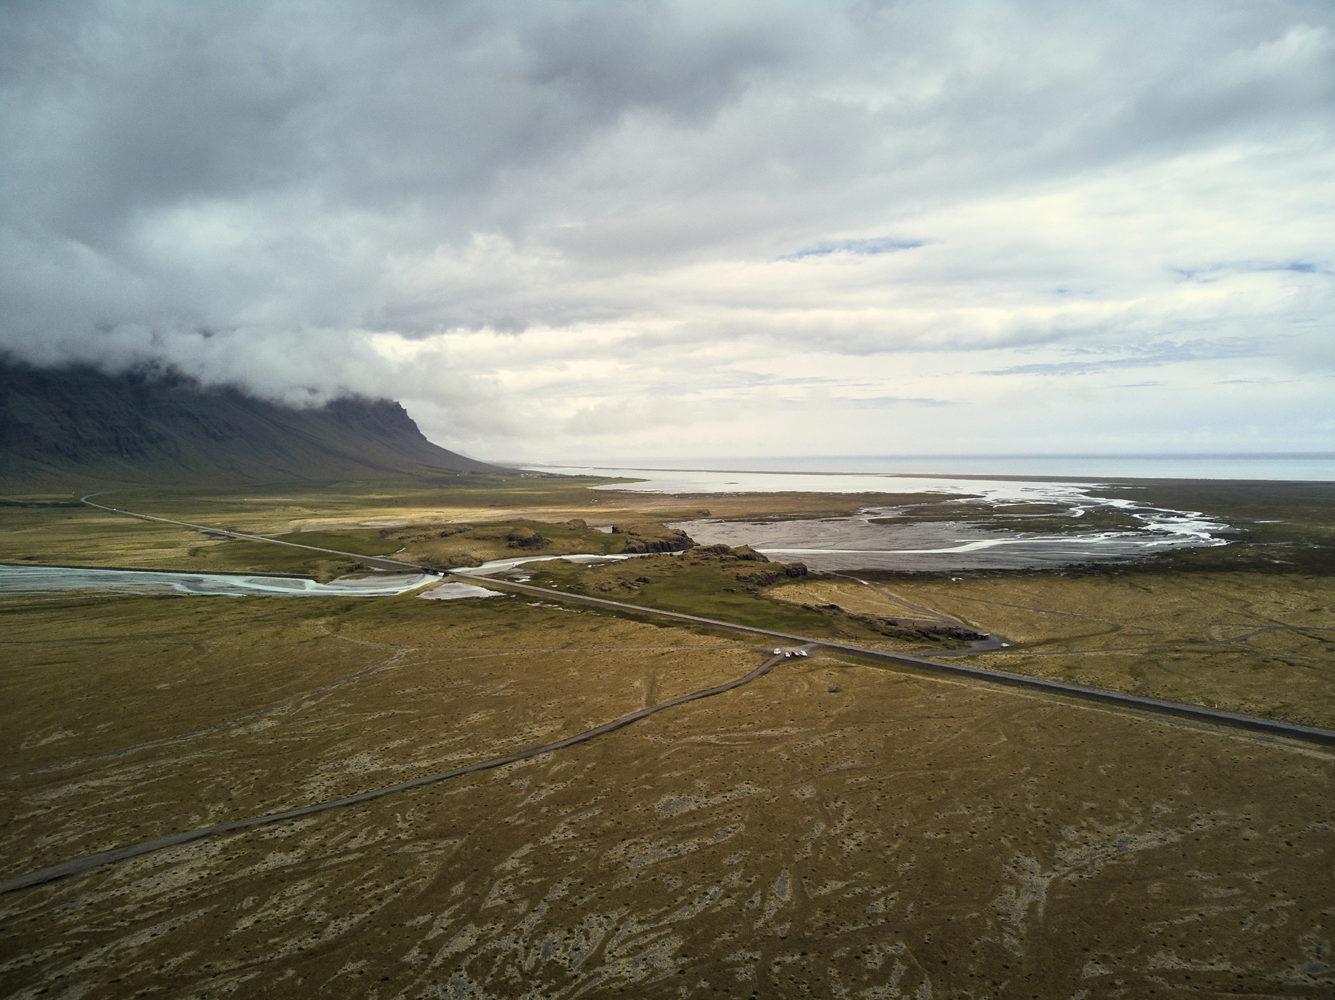 Snaeffelsnes, Geheimtipp, Drohne, Drohnenaufnahme, Drohnenshot, drone shot, flying drones in Iceland, Drohnefliegen in Island, Rundreise, Roadtrip, Tagesausflug, Halbinsel, Aussicht, Sheeps Waterfall, Sheep's Waterfall